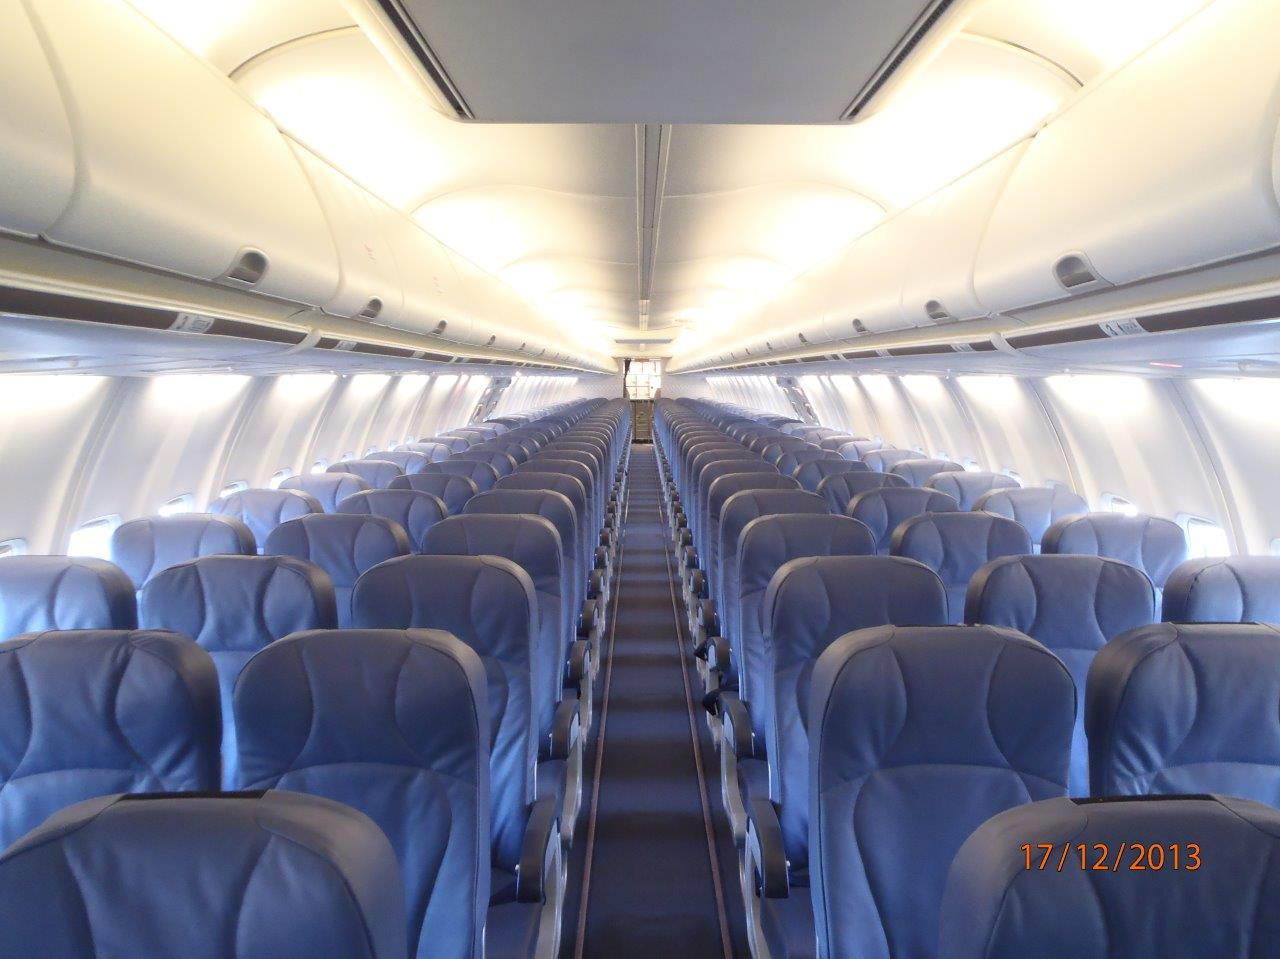 Crj 200 схема самолета фото 653